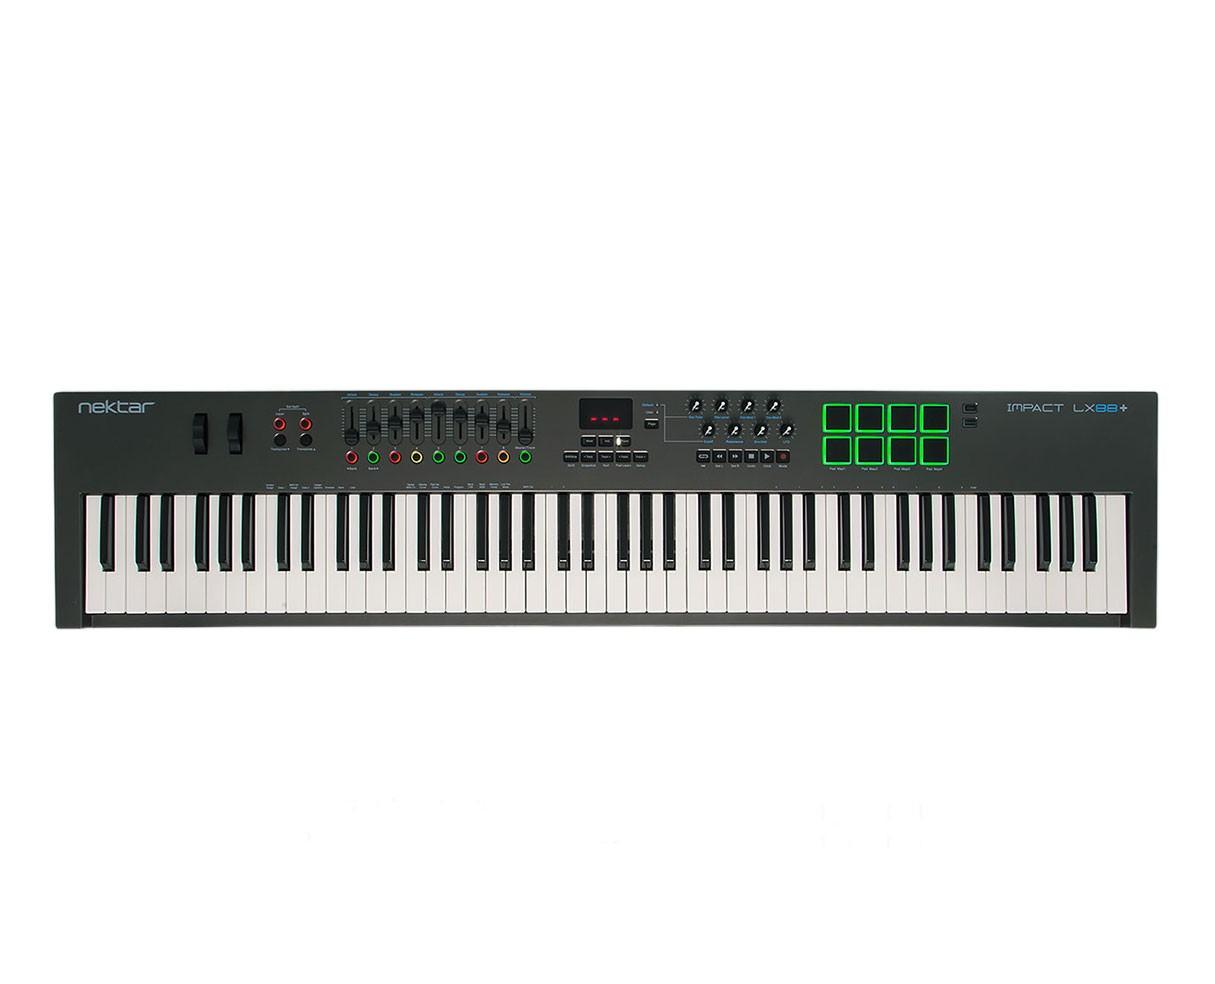 Nektar Impact LX88+ 88 Key Keyboard MIDI controller